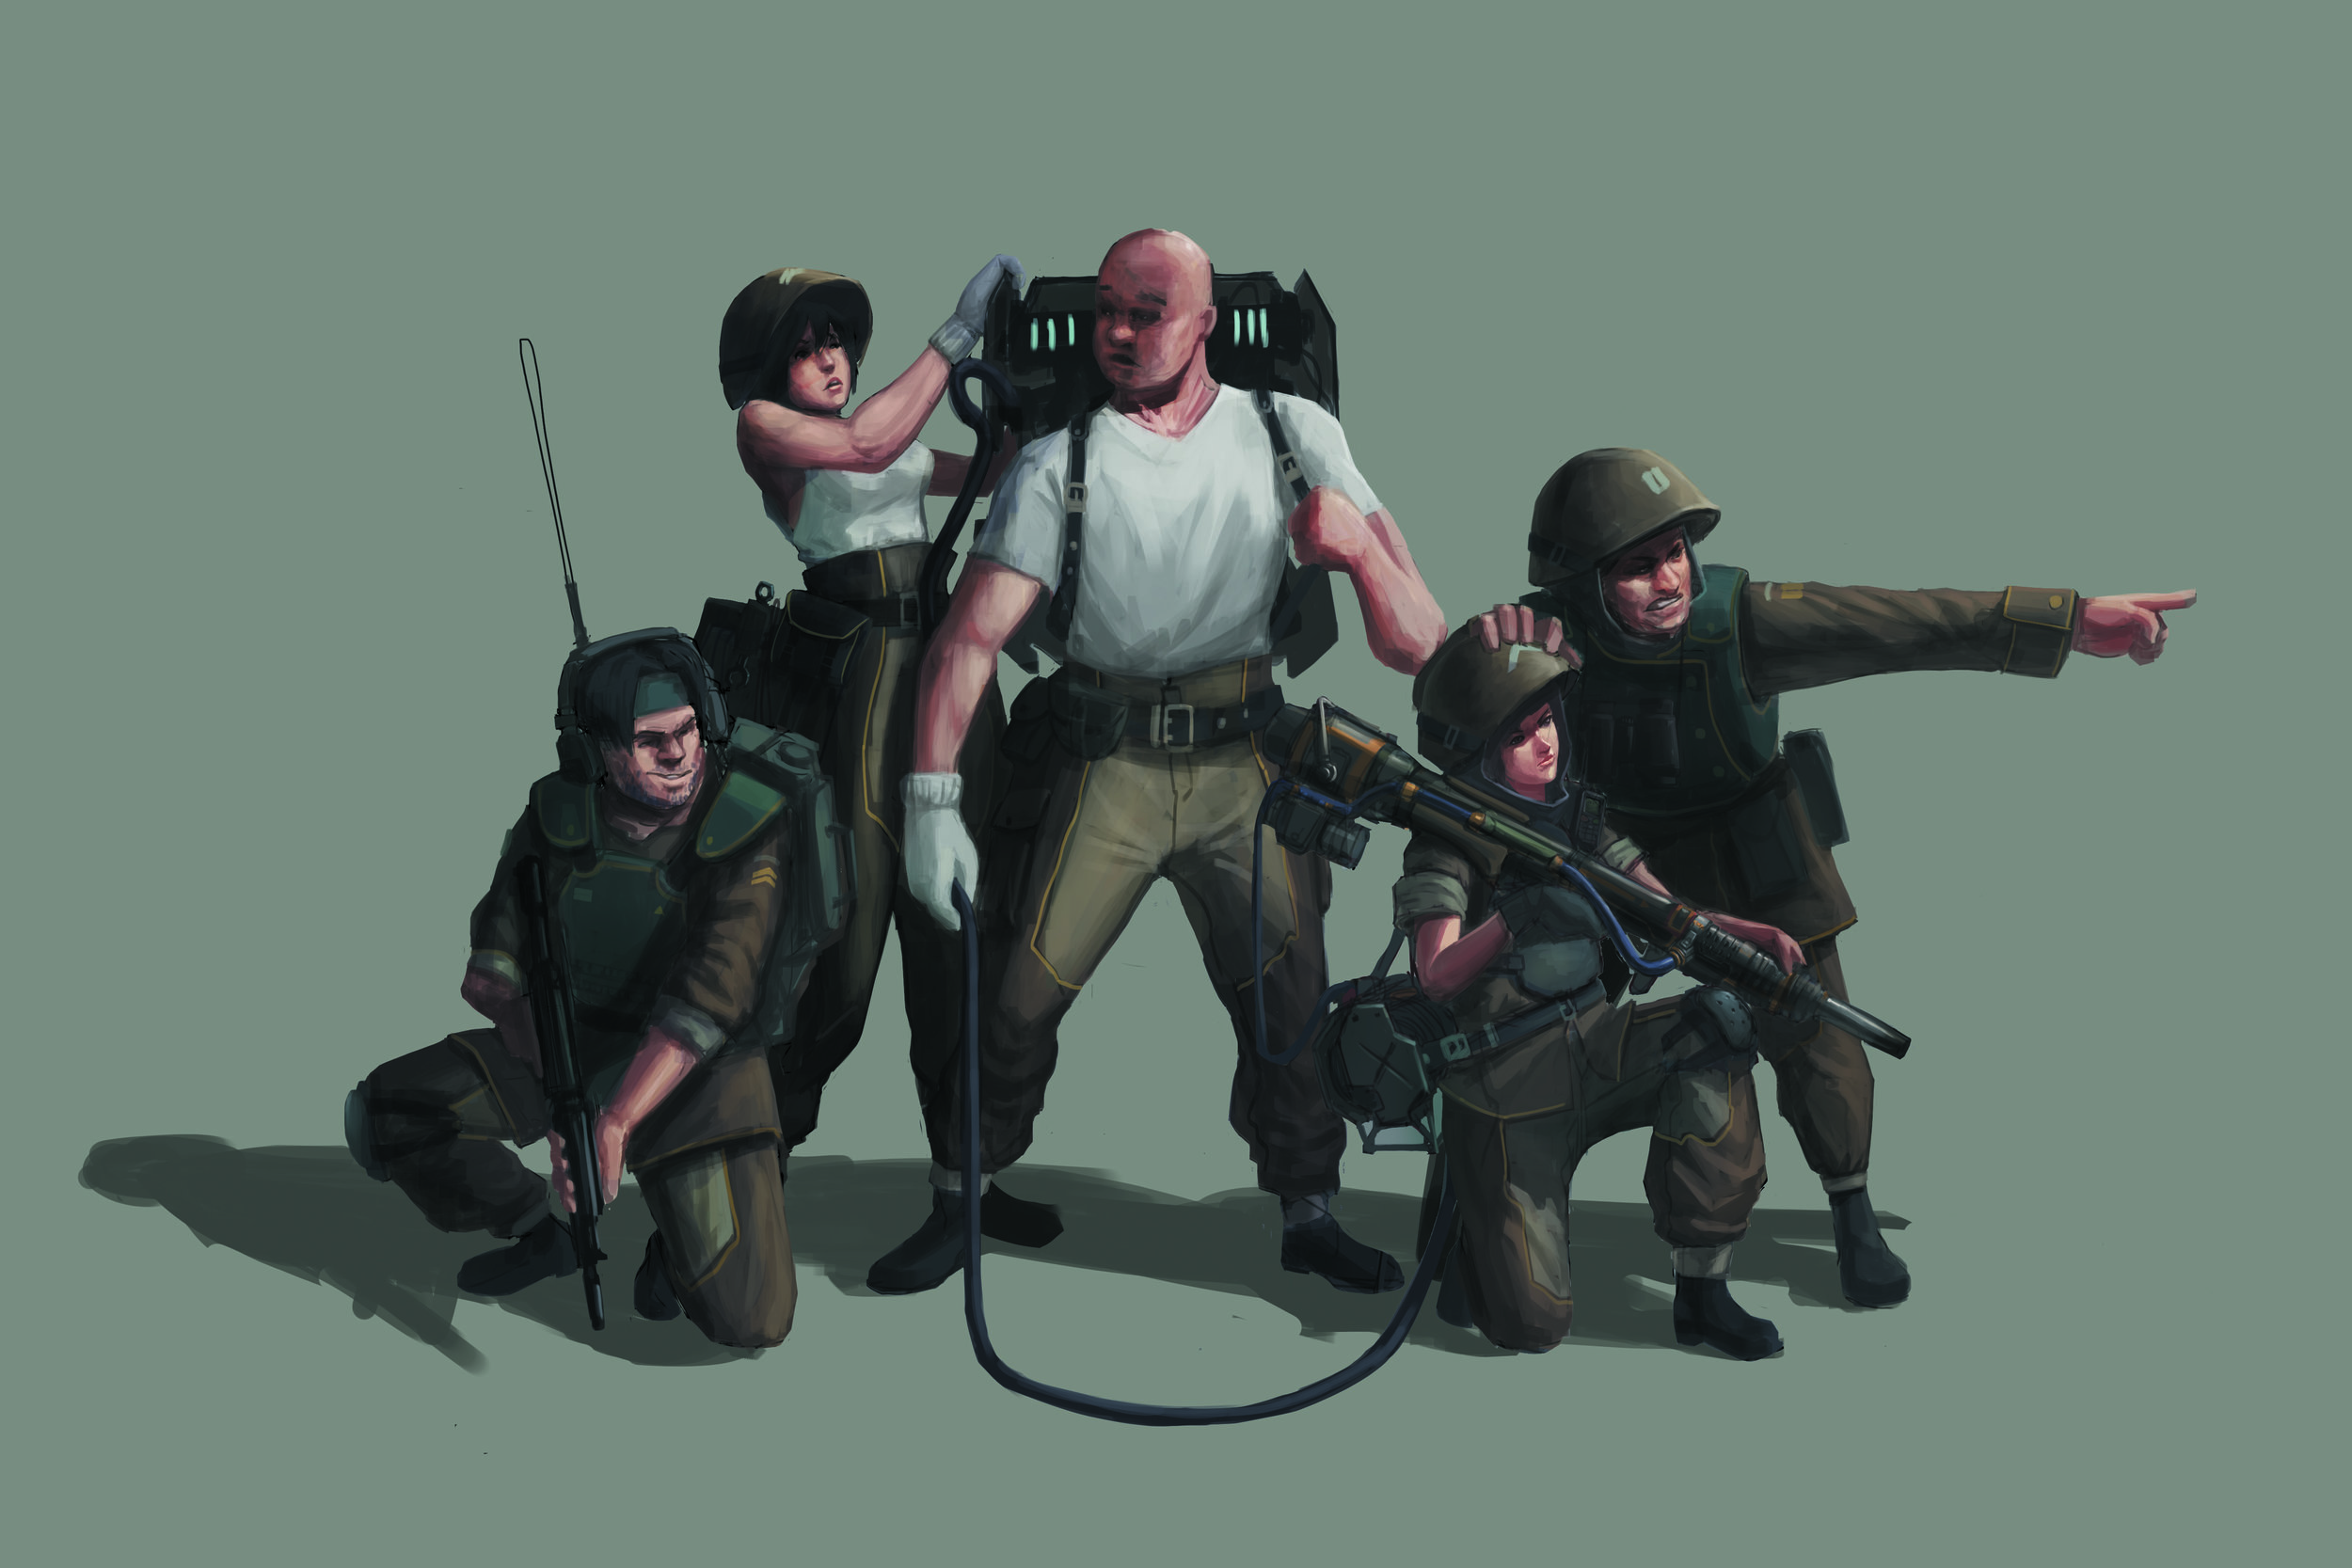 Railgun Squad | Yang Hu | Yanghudesign@gmail.com | 626-316-9992